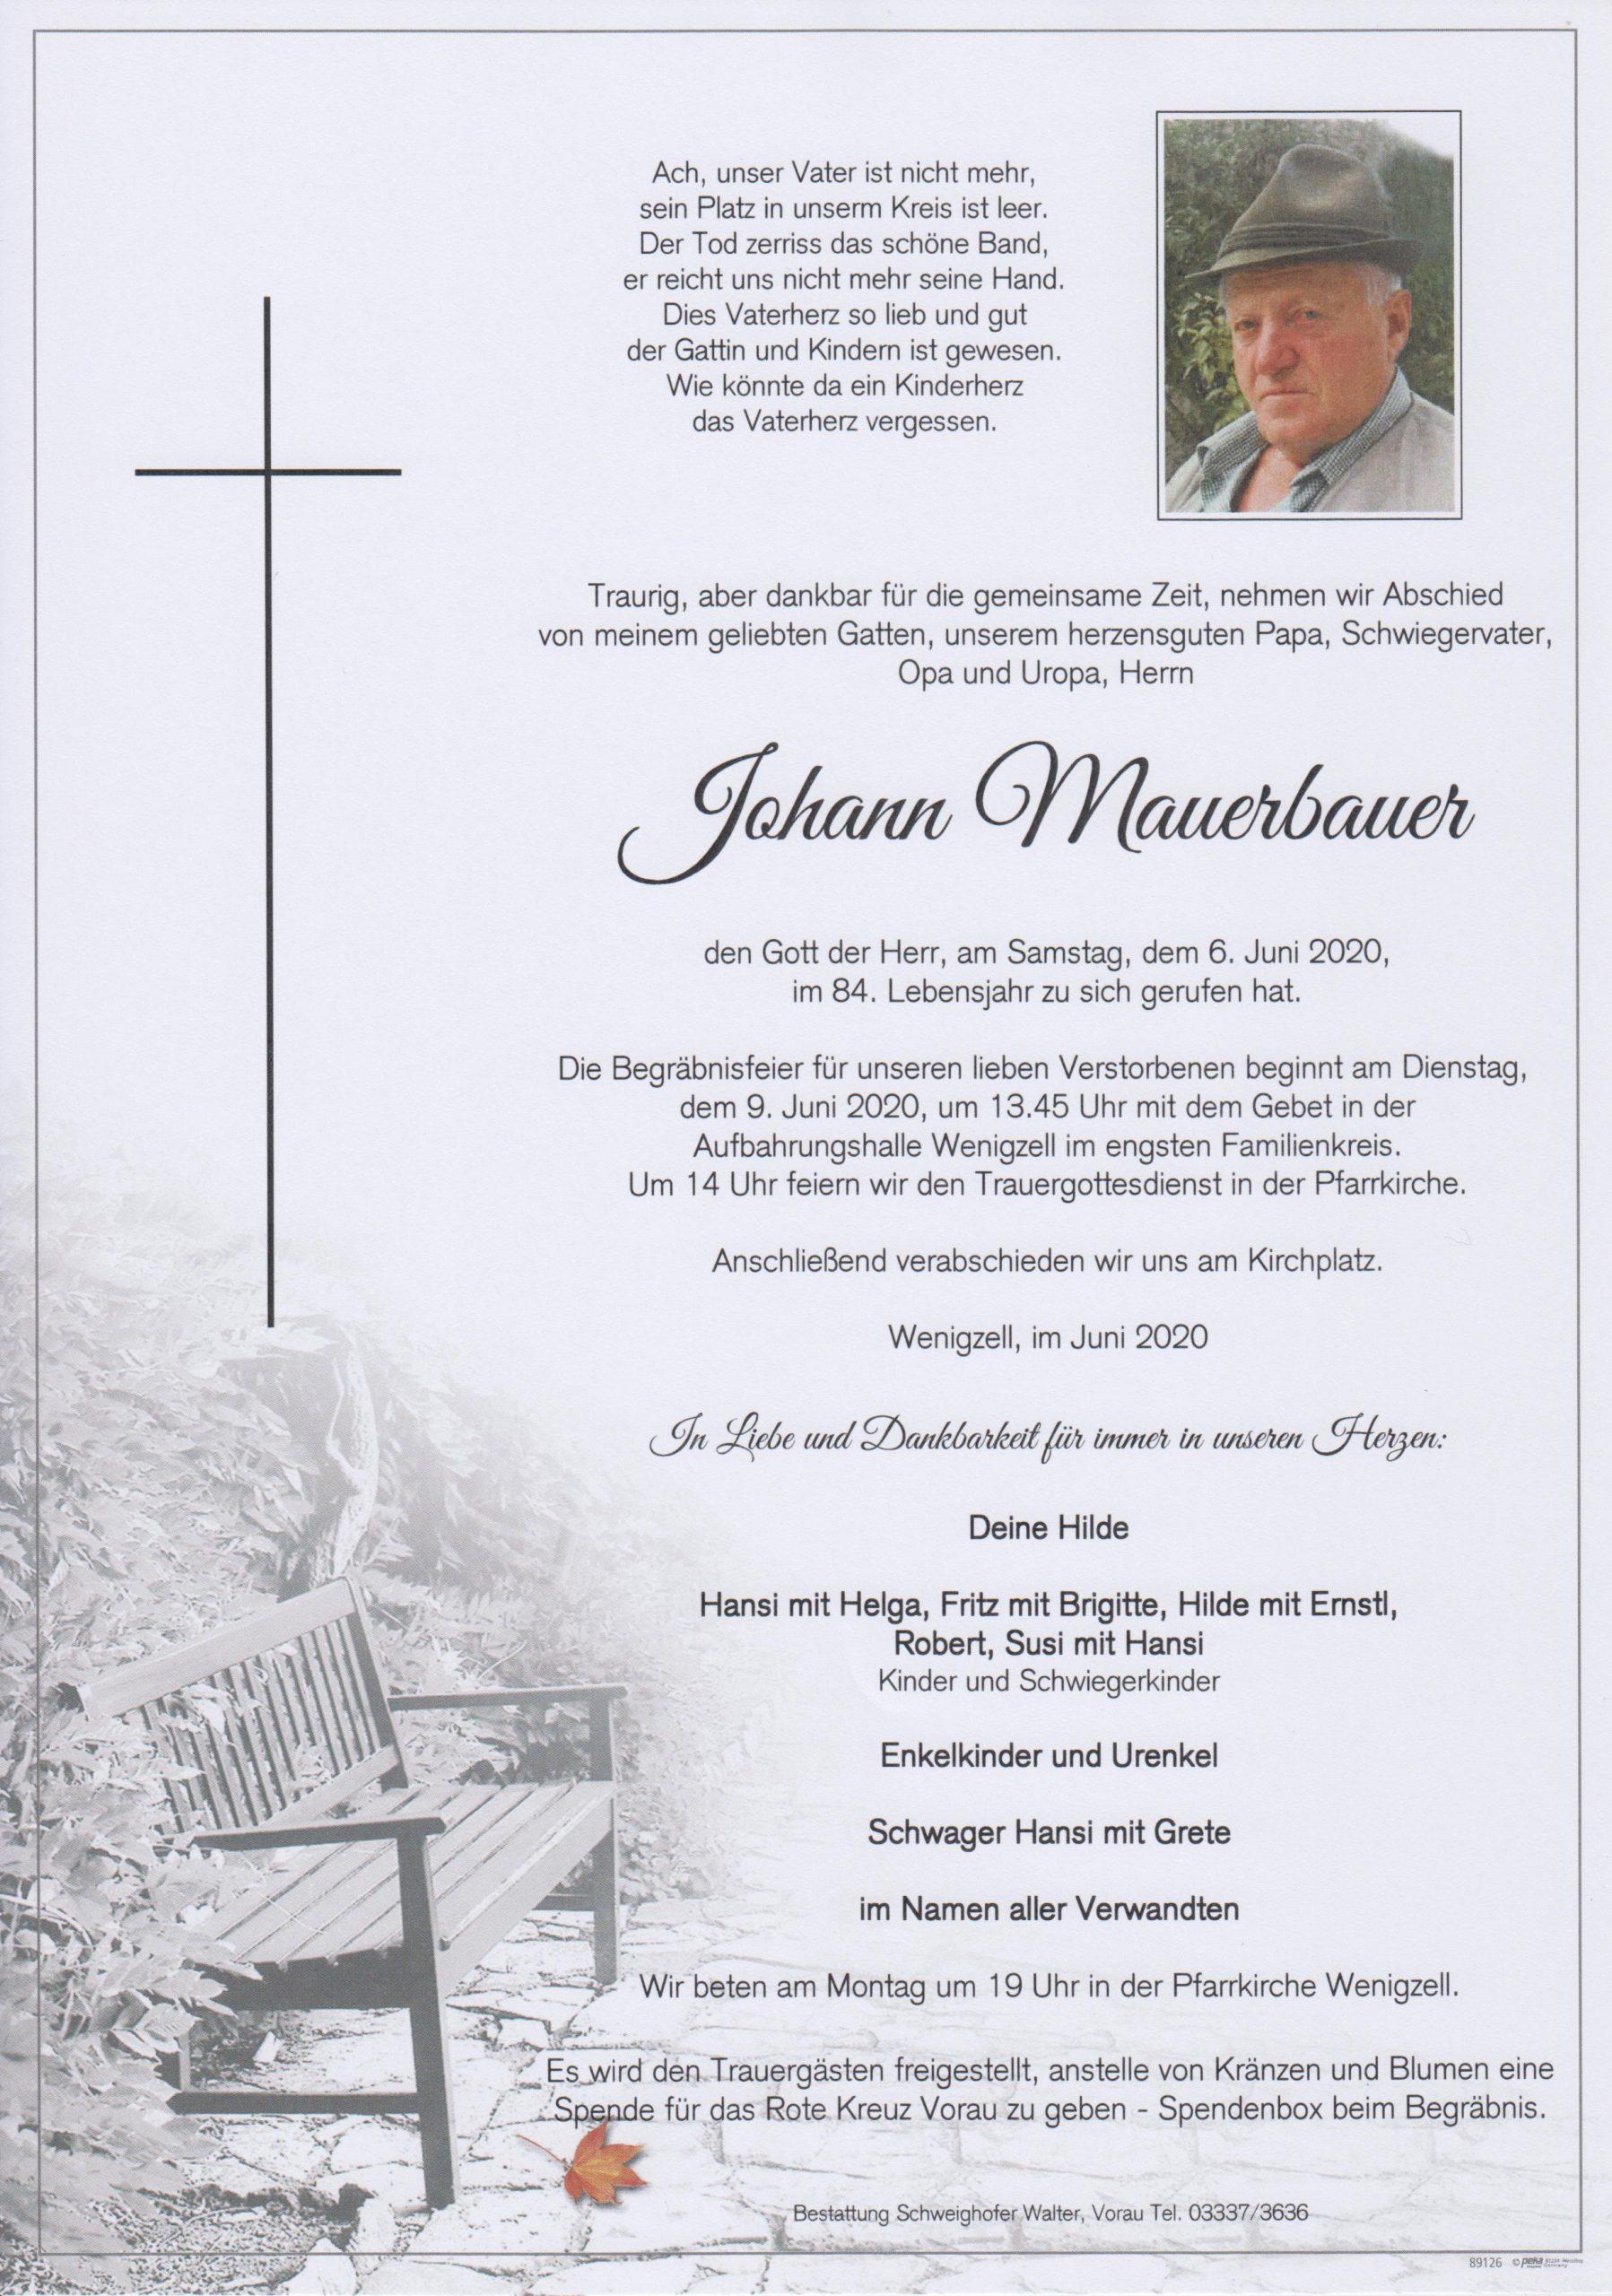 Johann Mauerbauer